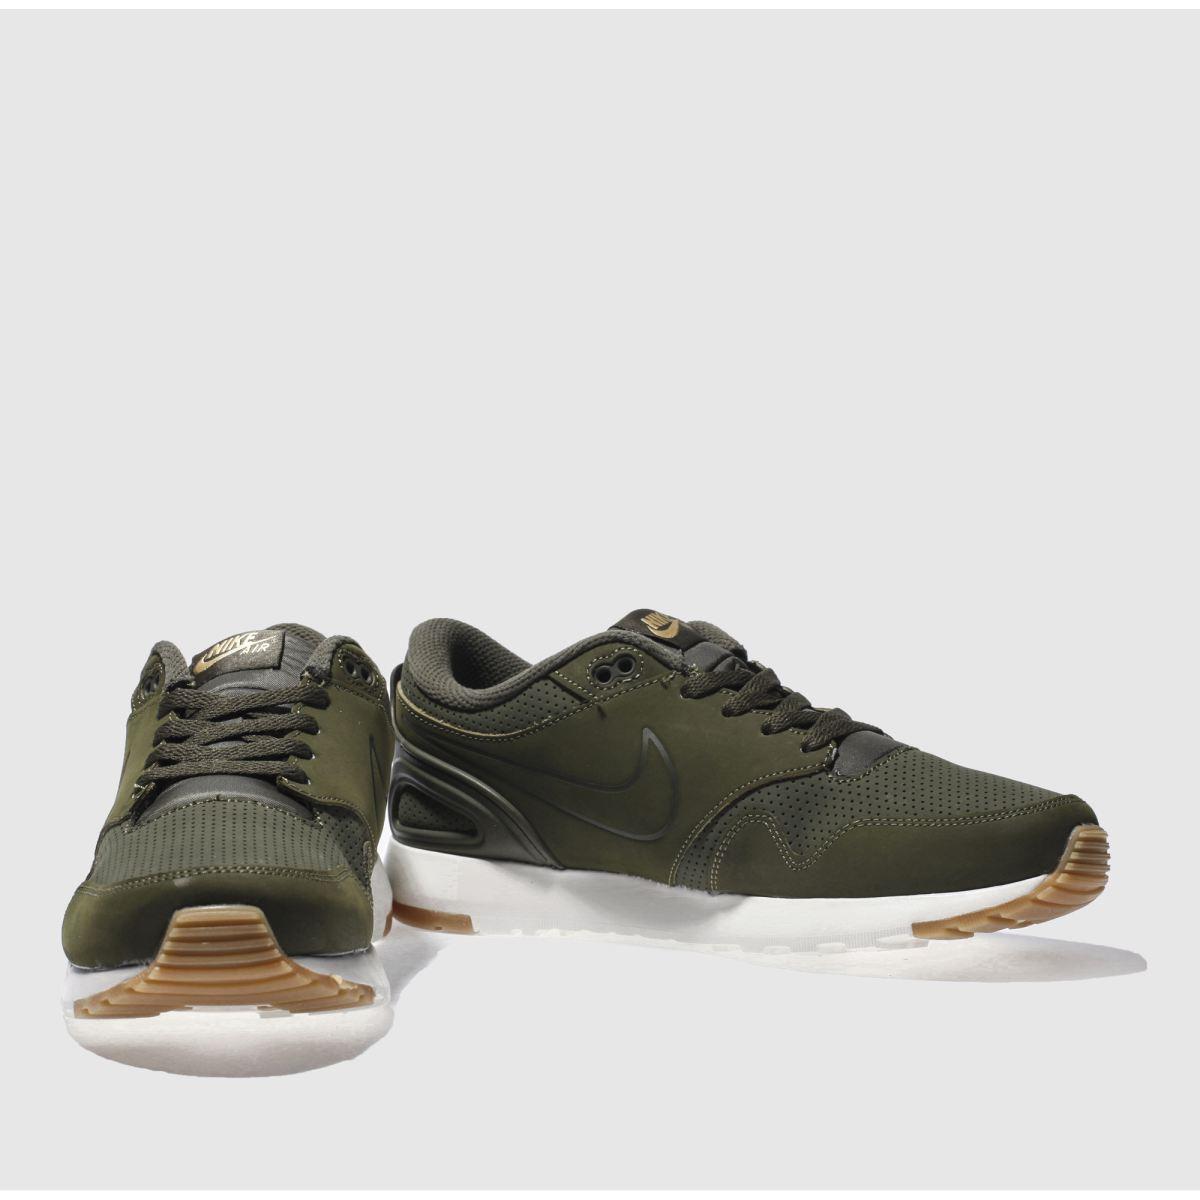 a7a83414bb62b Herren Khaki nike schuh Air Vibenna Sneaker